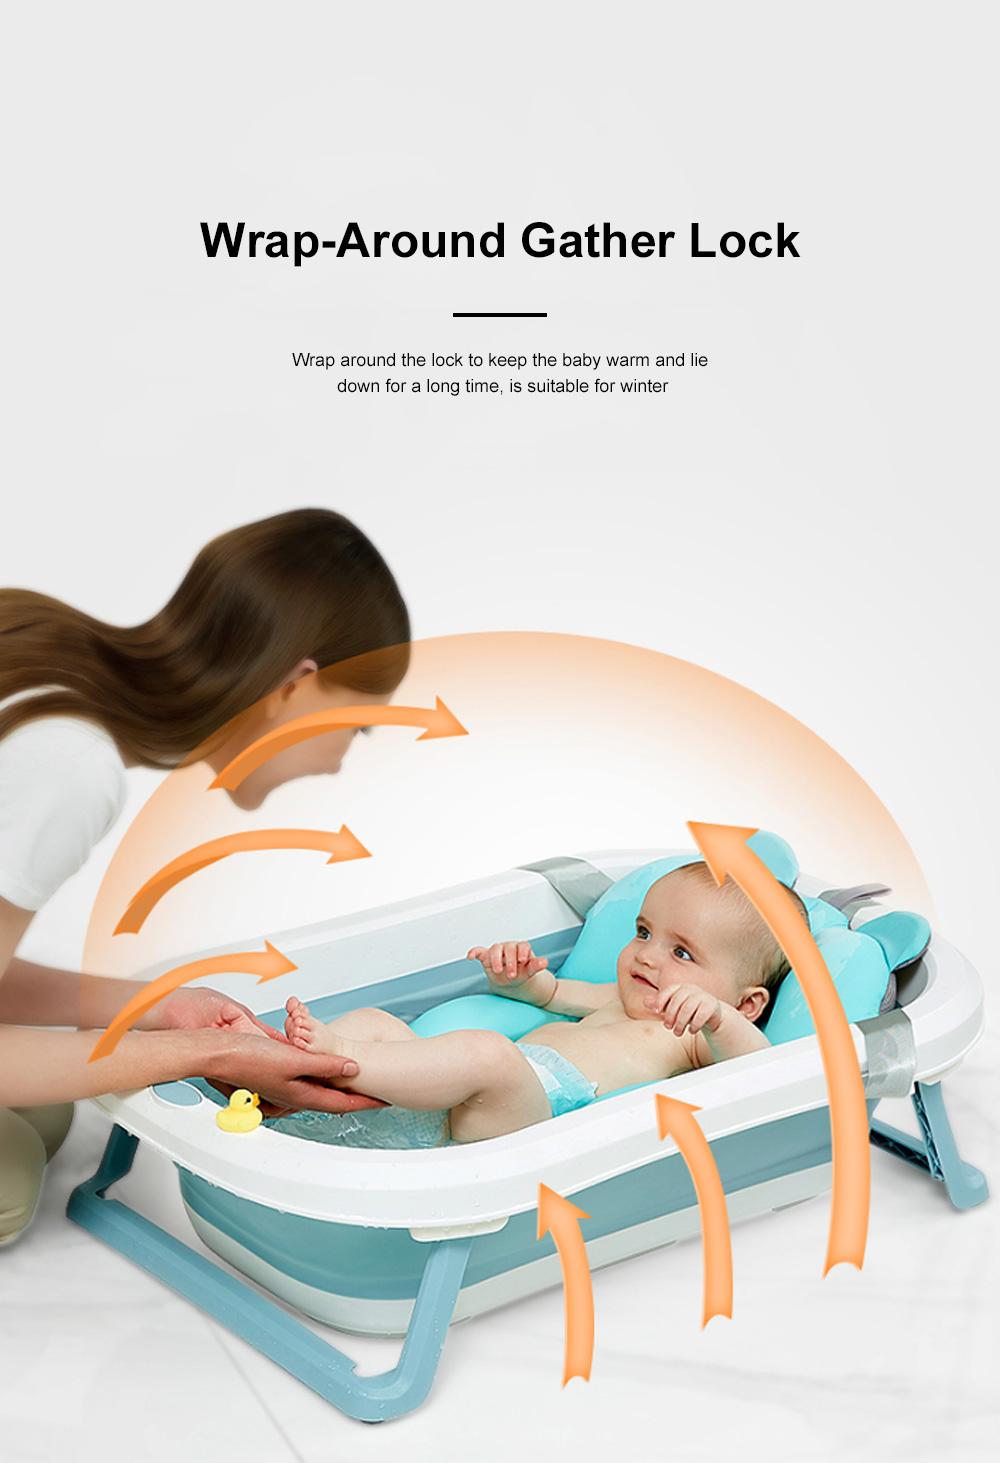 Portable Folding Baby Bath Tub Anti-Slip Bottom Non-Toxic Material Children Bathtub Bucket For Baby within 5 Year Old 7